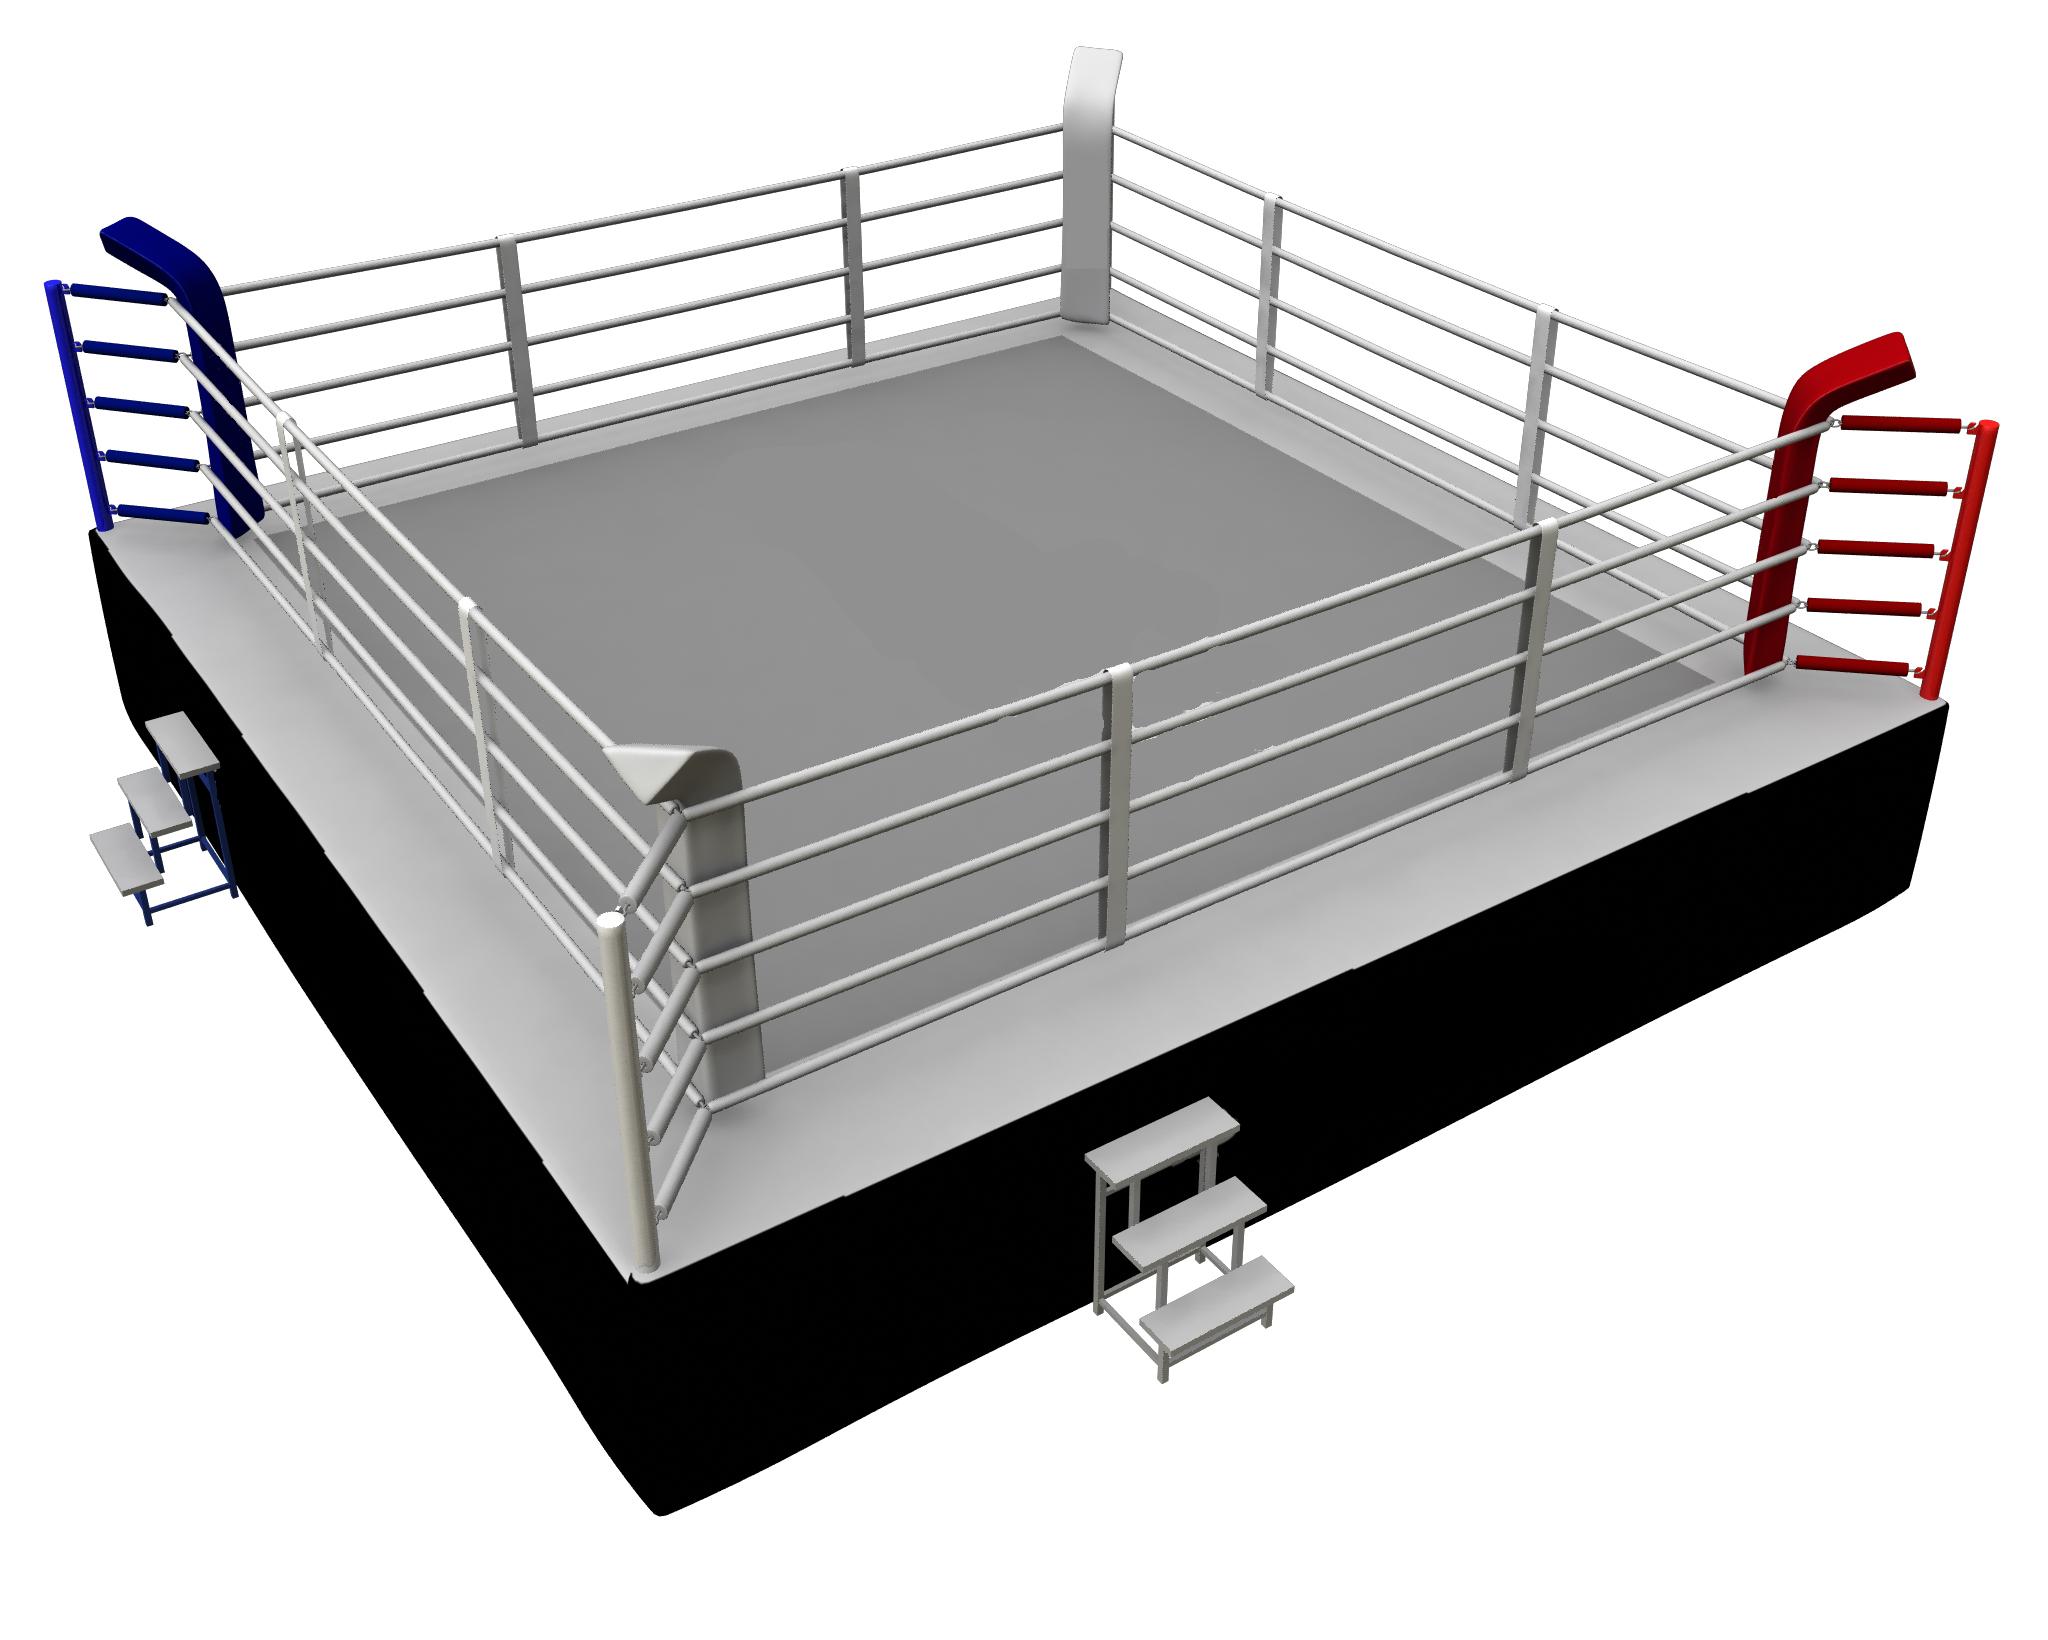 Ring de boxe compétition MMA